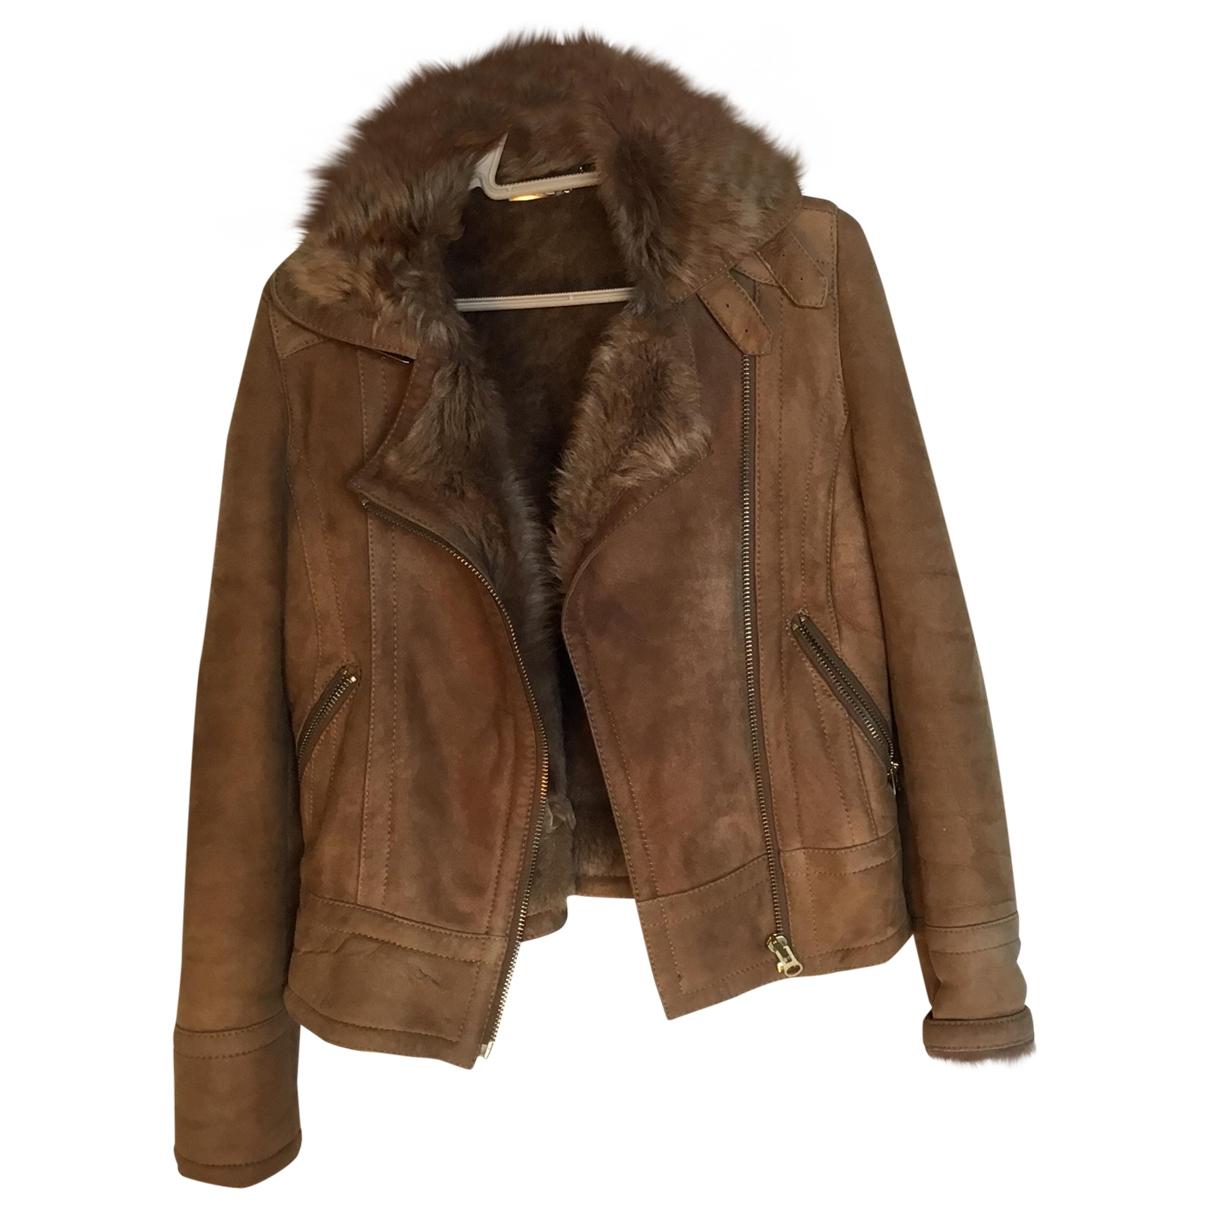 Massimo Dutti \N Camel Suede coat for Women S International